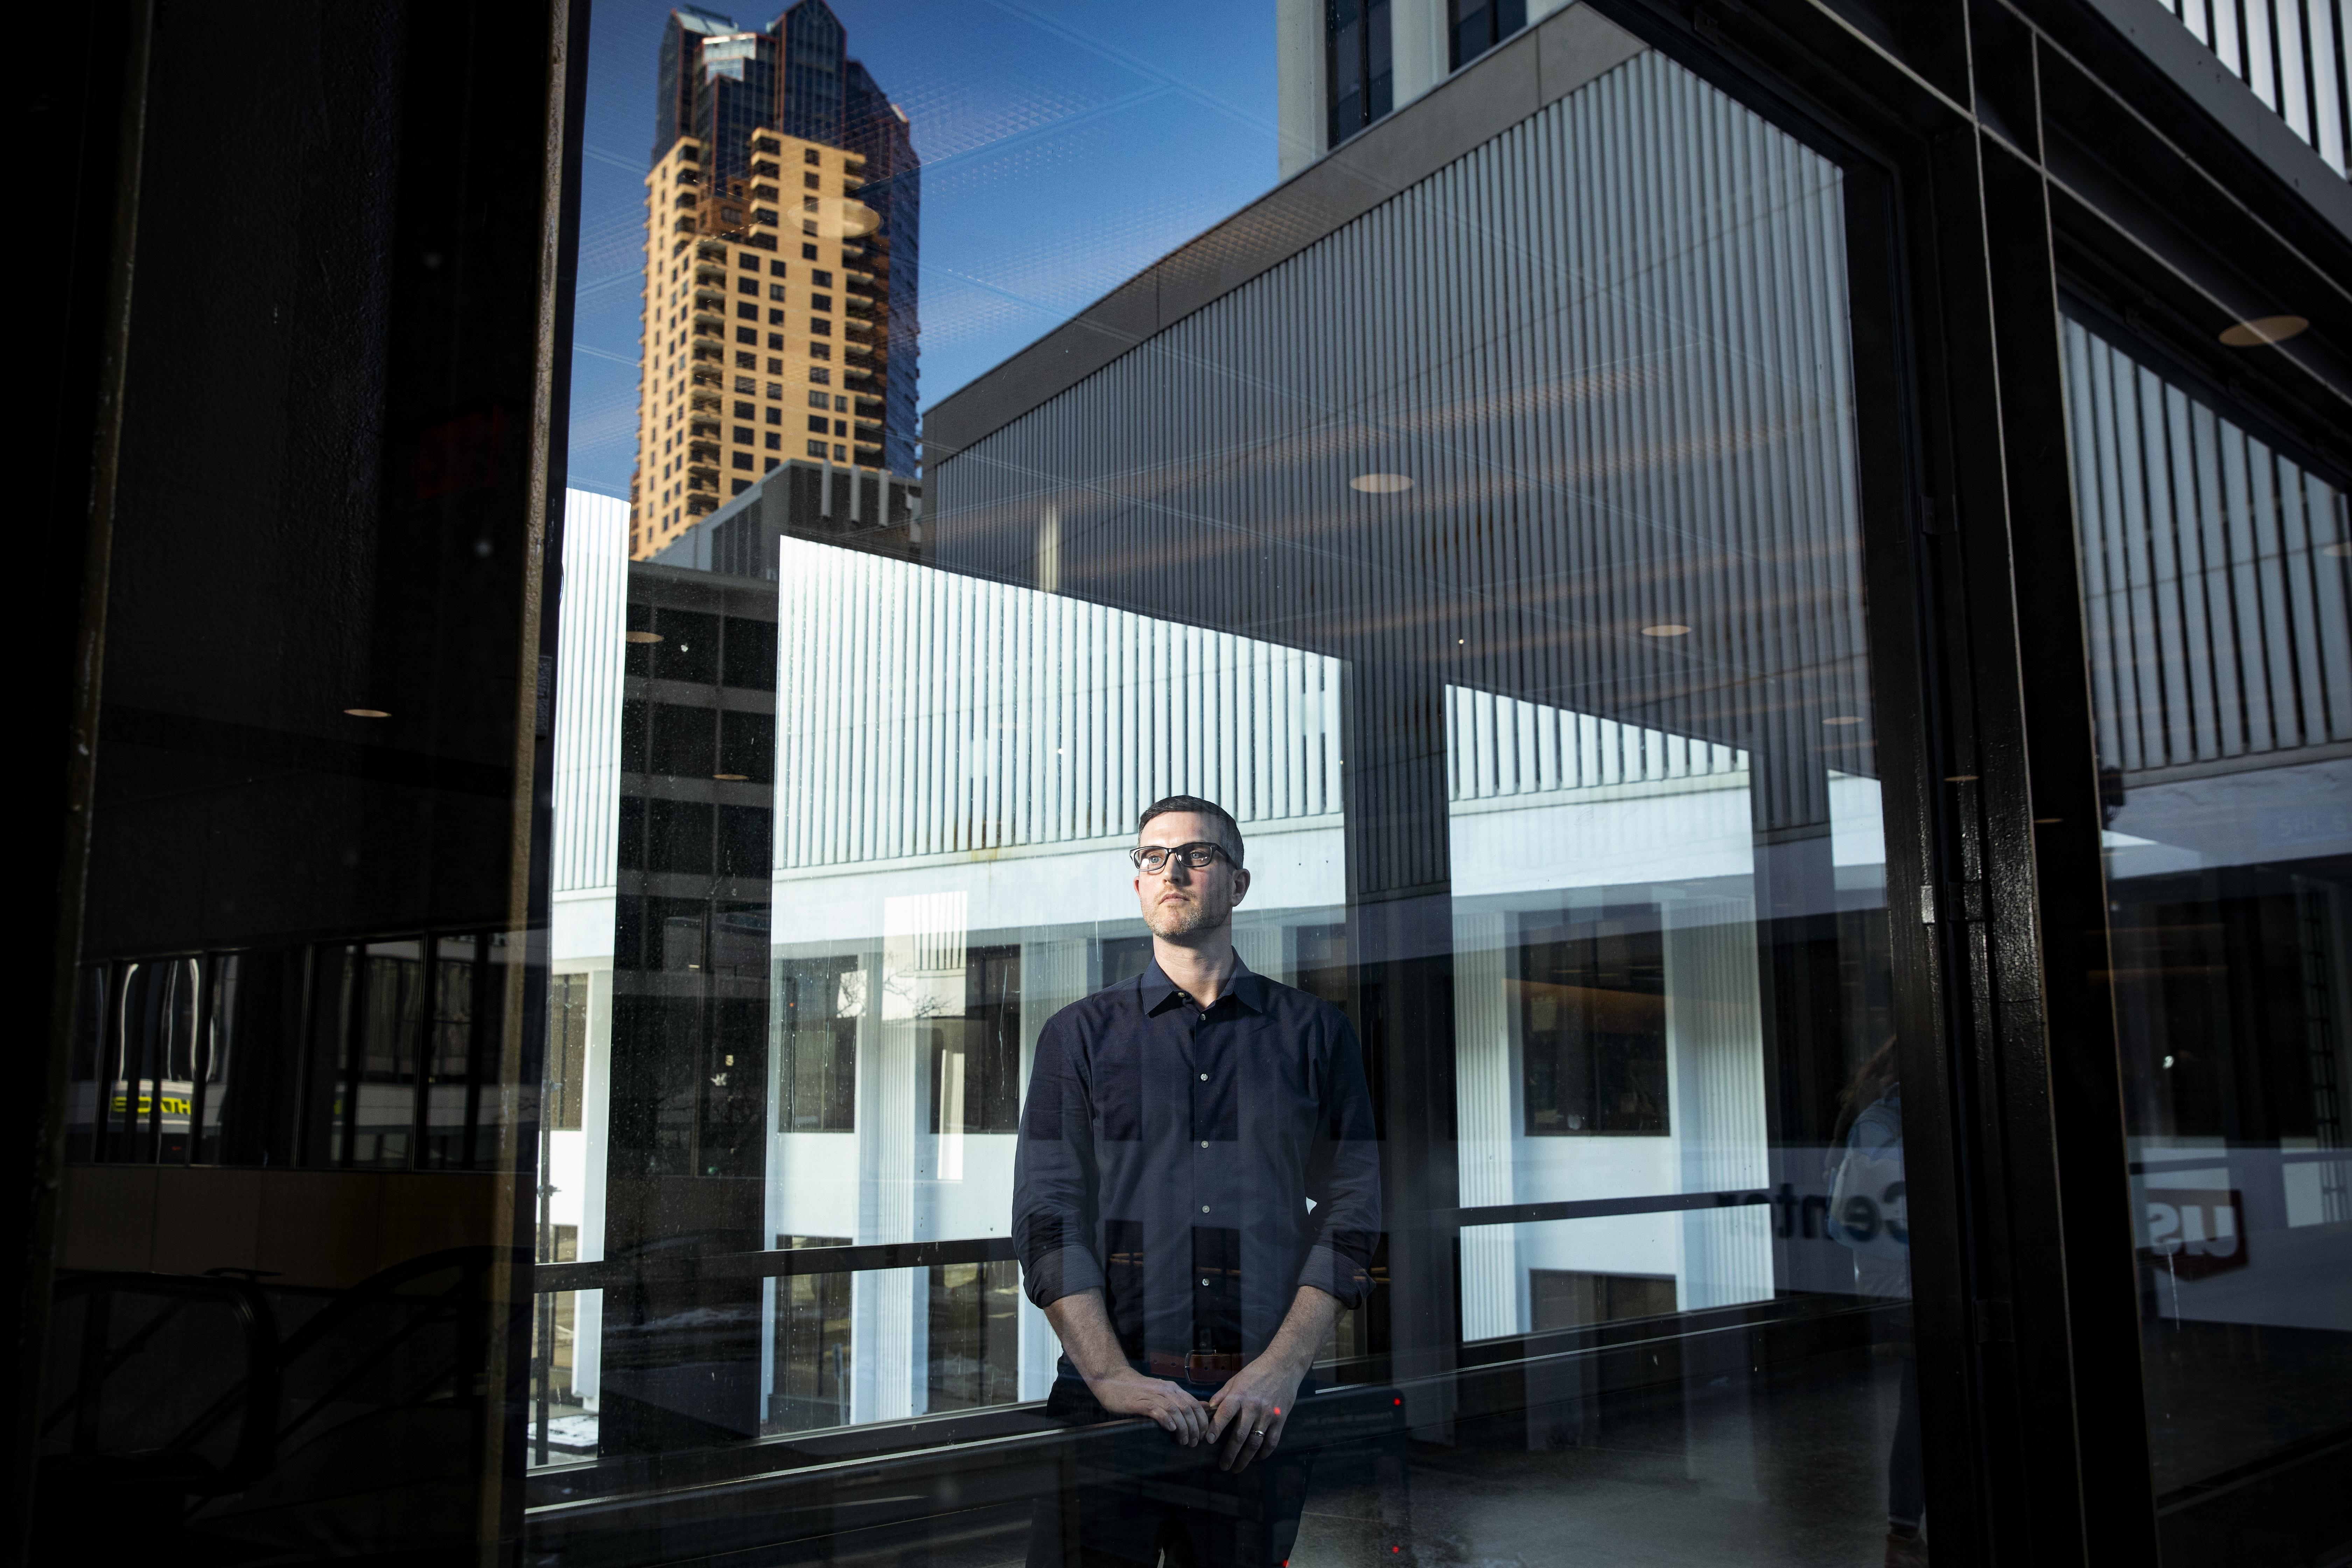 Ian McLoone felt stigmatized for using methadone to help him stop using heroin.